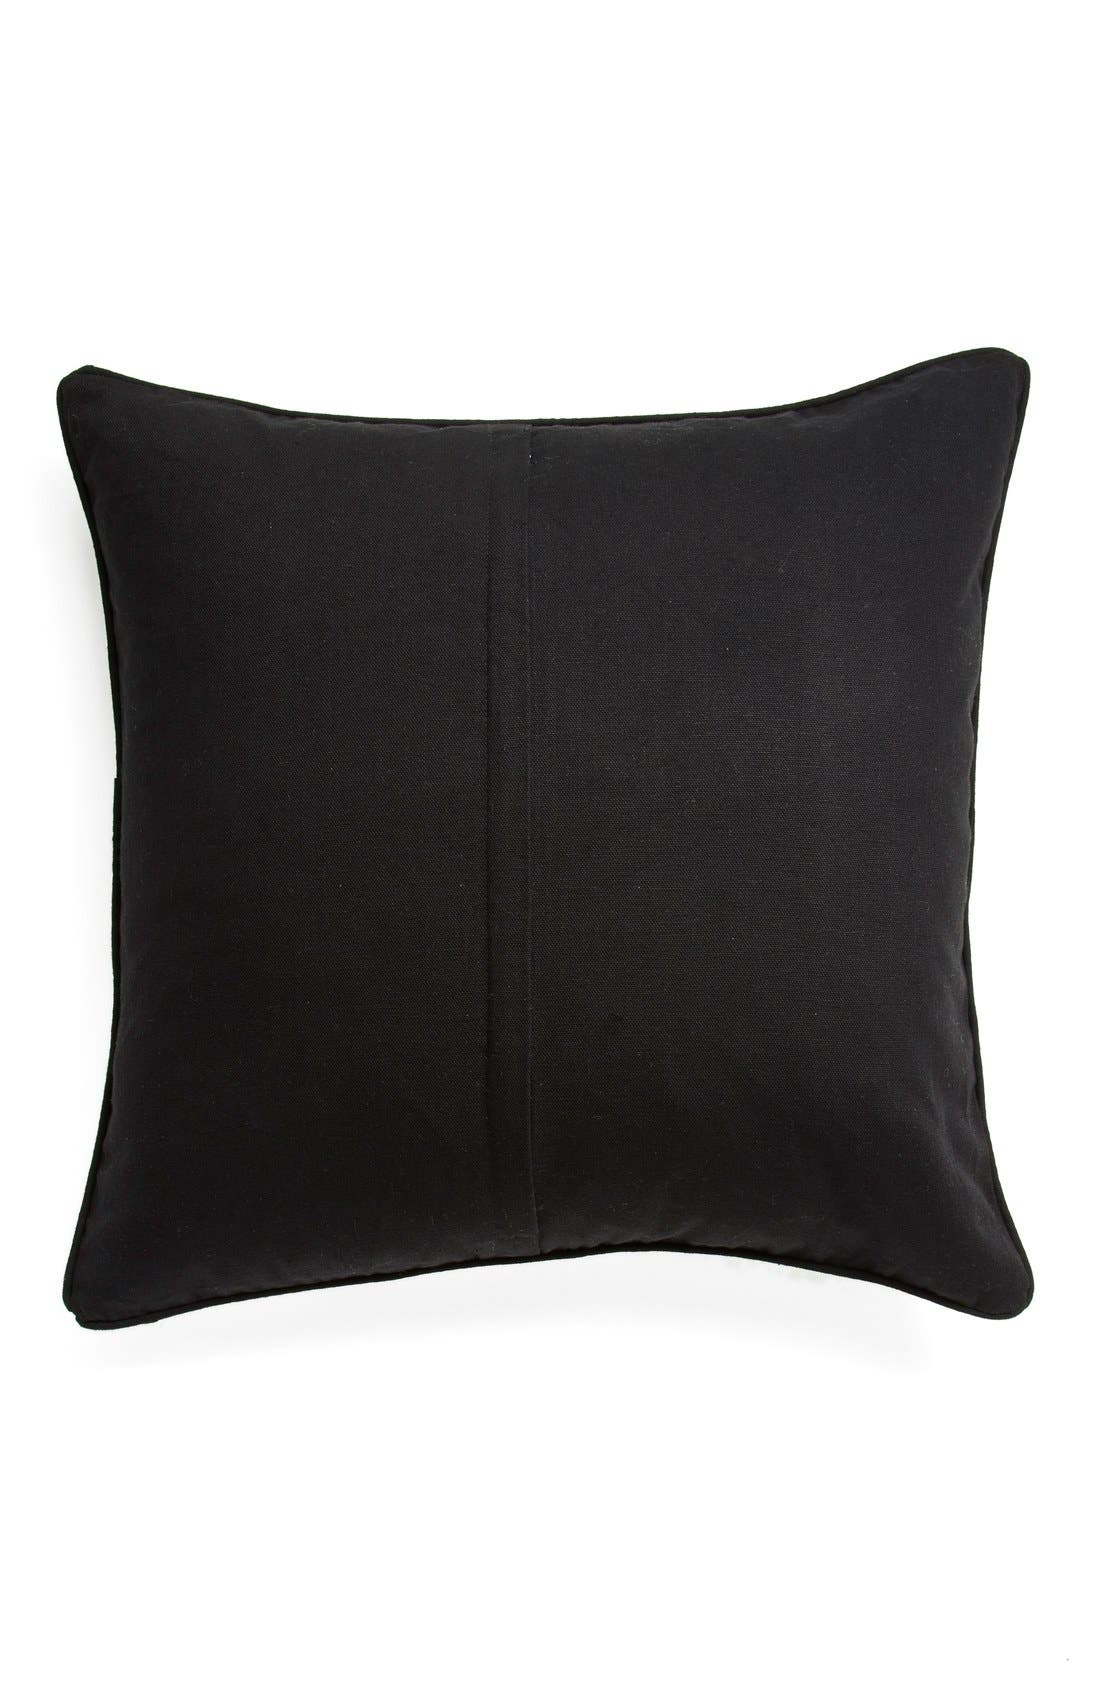 'Creep'n It Real' Pillow,                             Alternate thumbnail 2, color,                             250